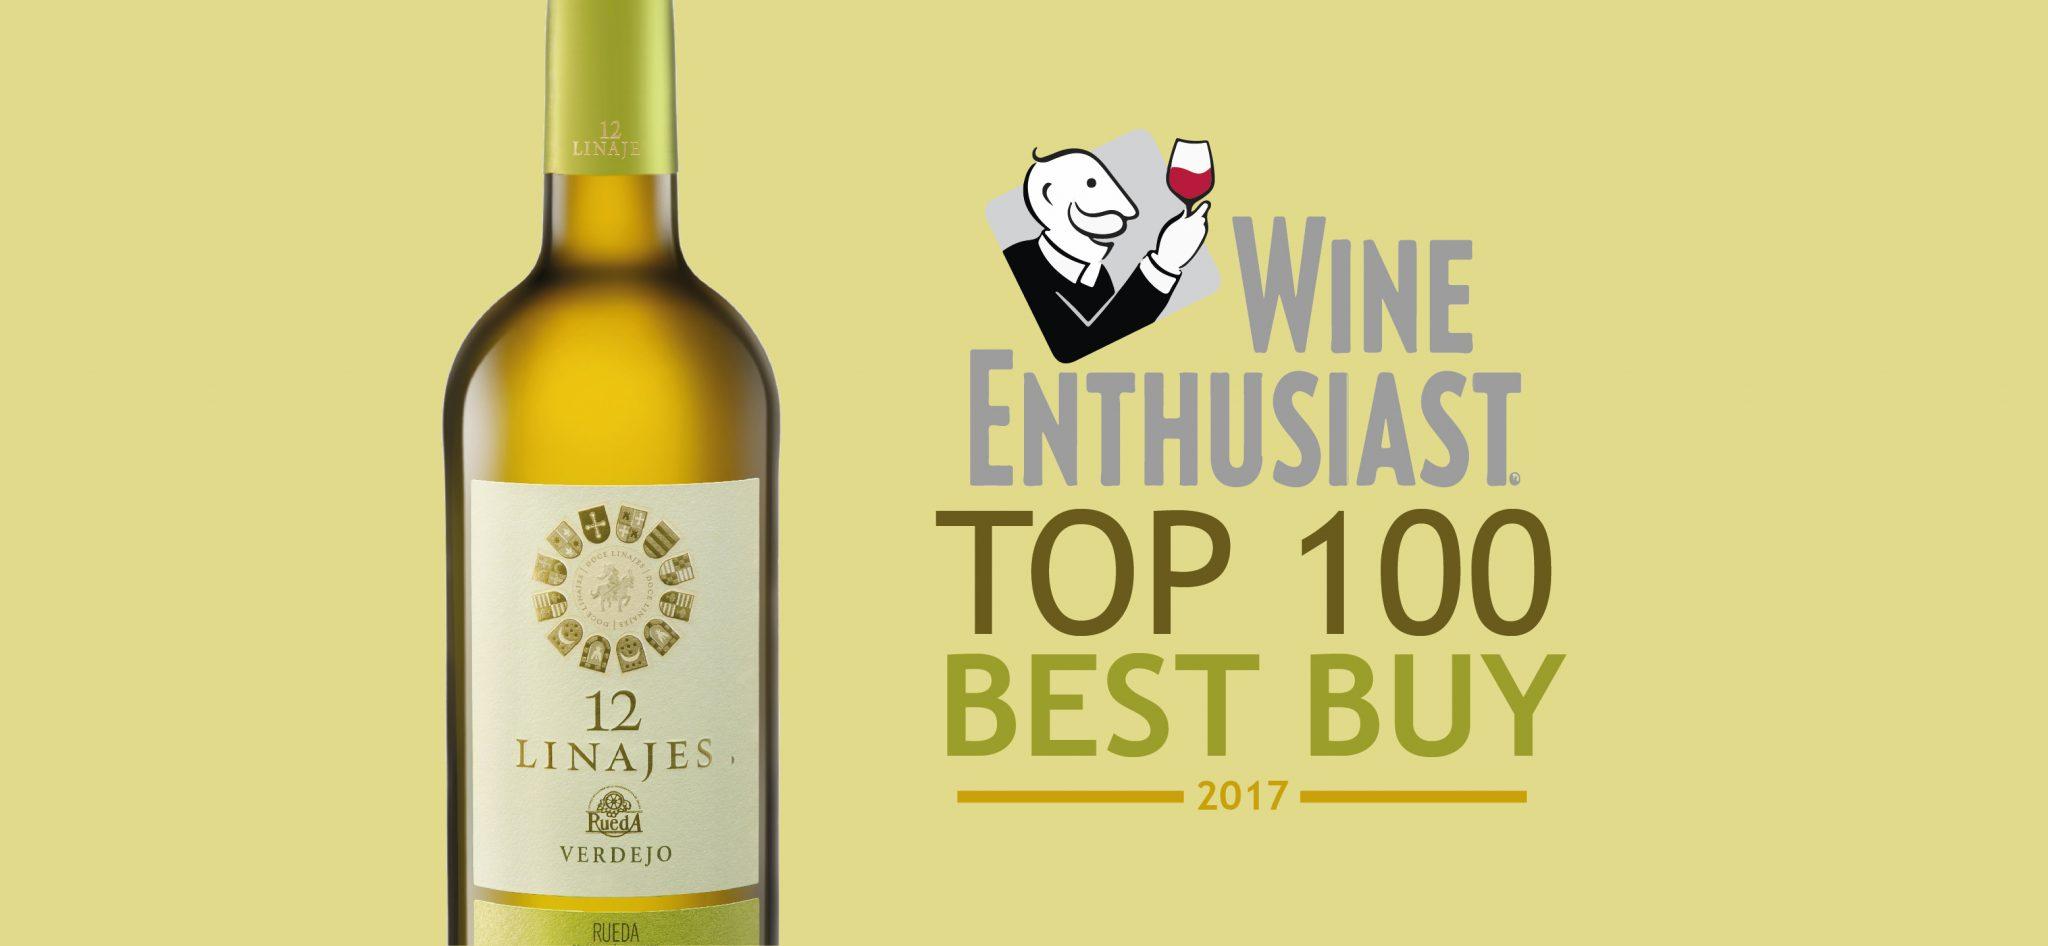 12 Linajes Verdejo – Top 100